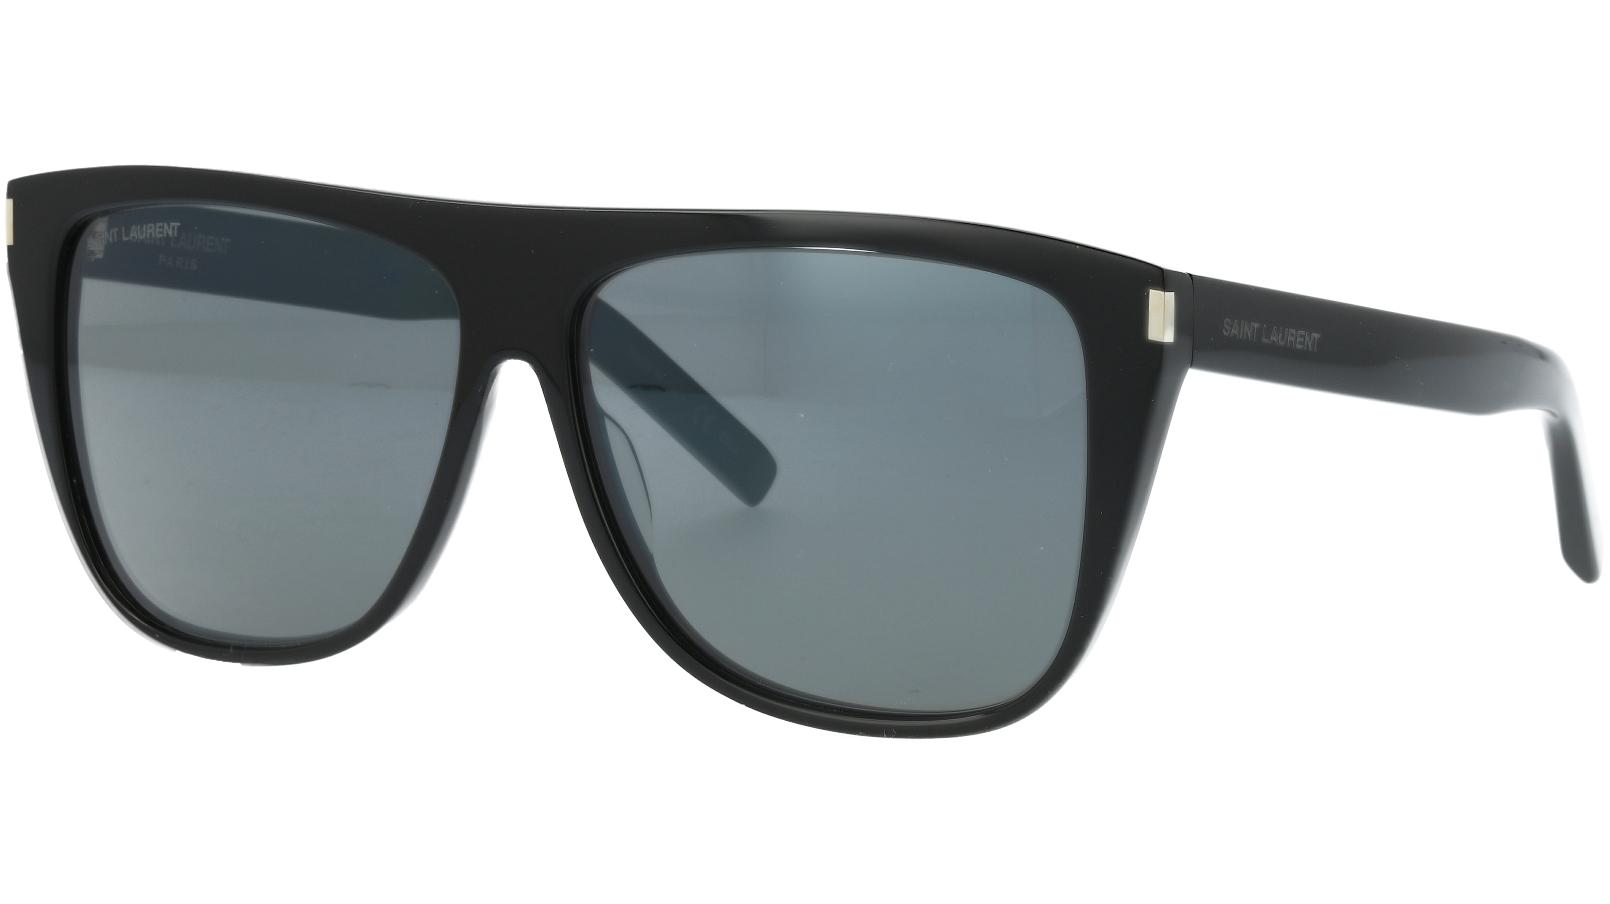 Saint Laurent SL51 002 50 Black Sunglasses